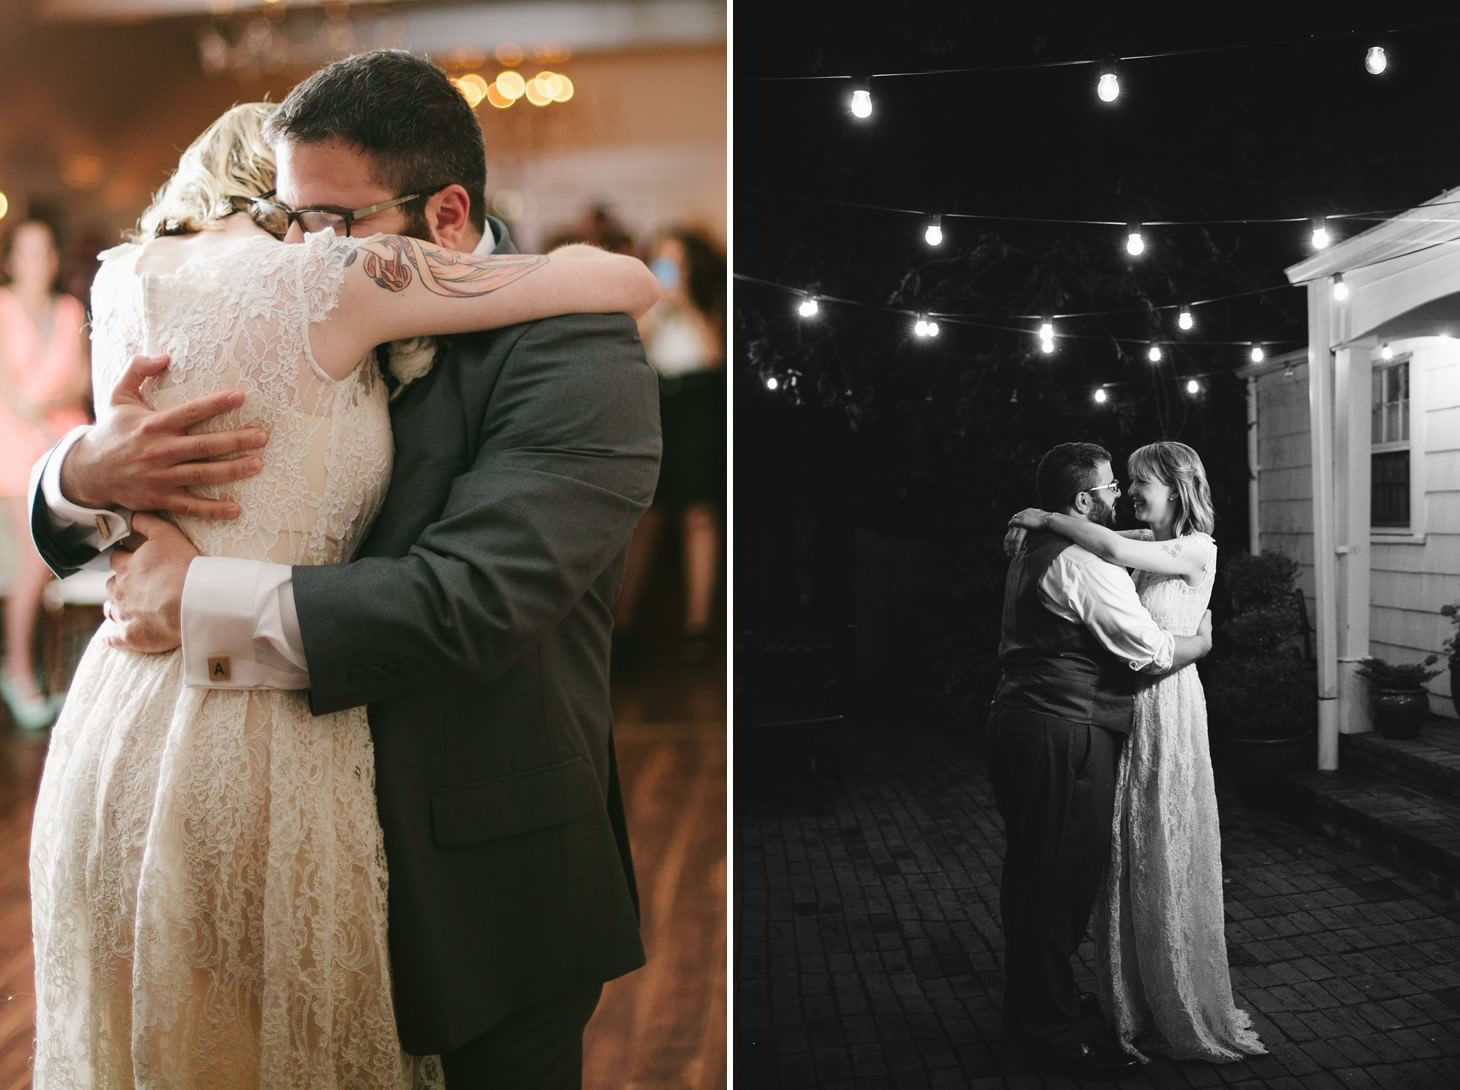 nyc-wedding-photographer-brooklyn-bridge-smitten-chickens-rainy-emotional-wedding-007.jpg